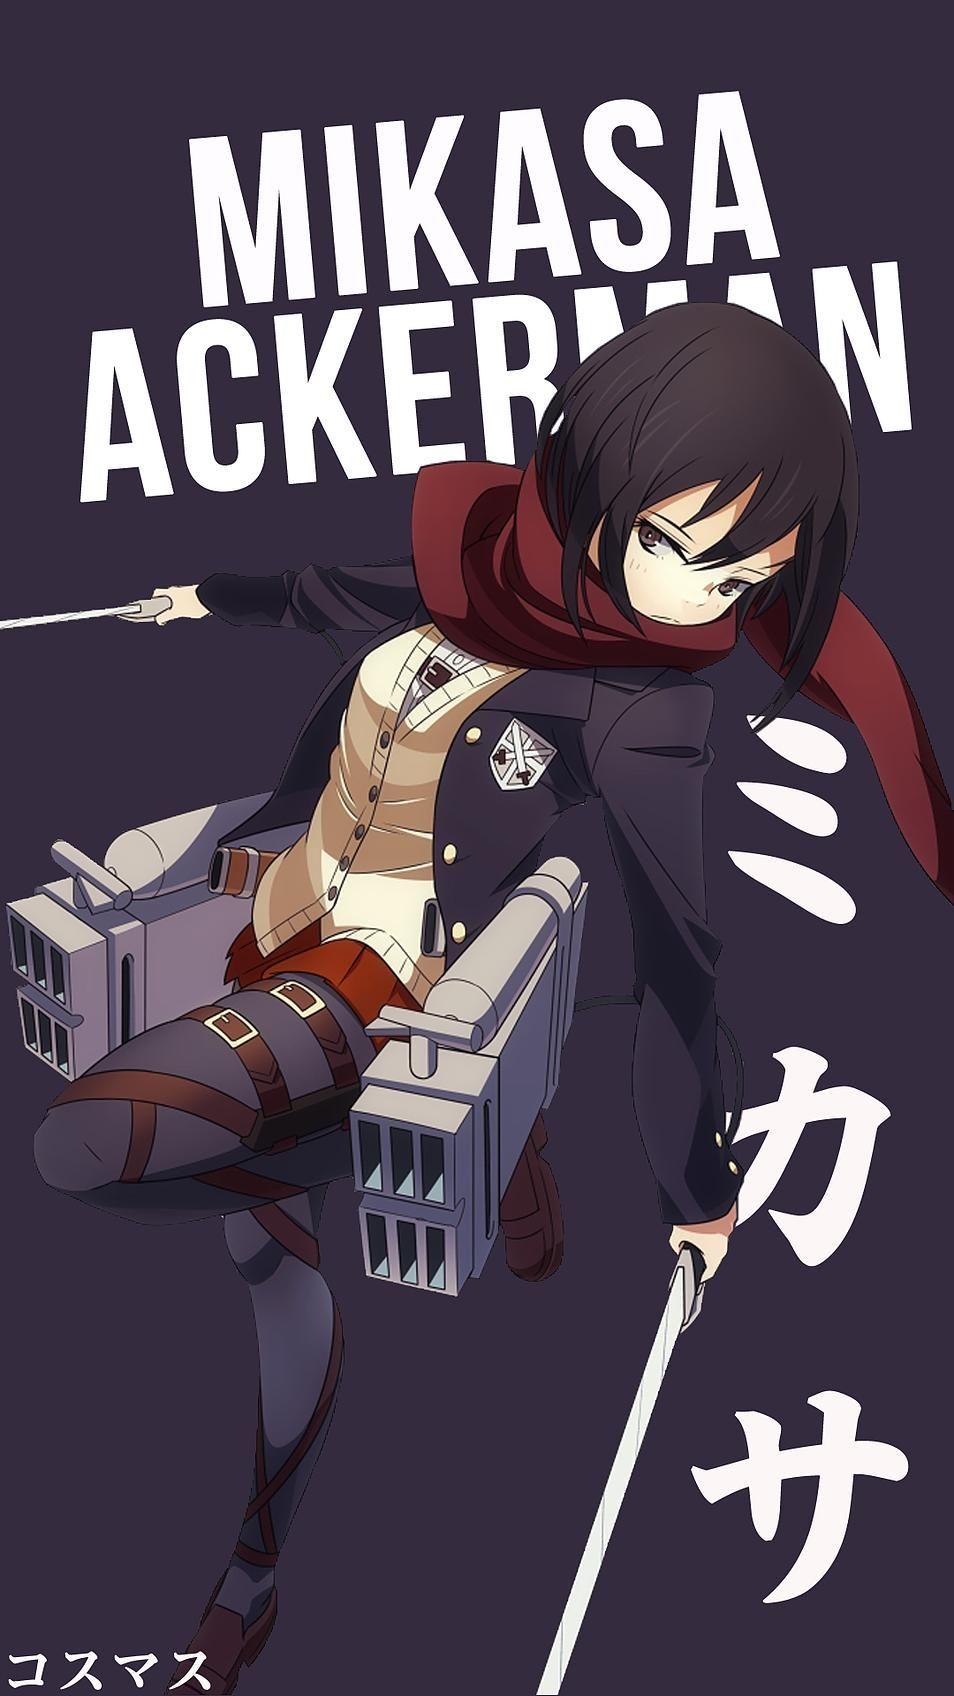 Mikasa Ackerman 3139674 Hd Wallpaper Backgrounds Download